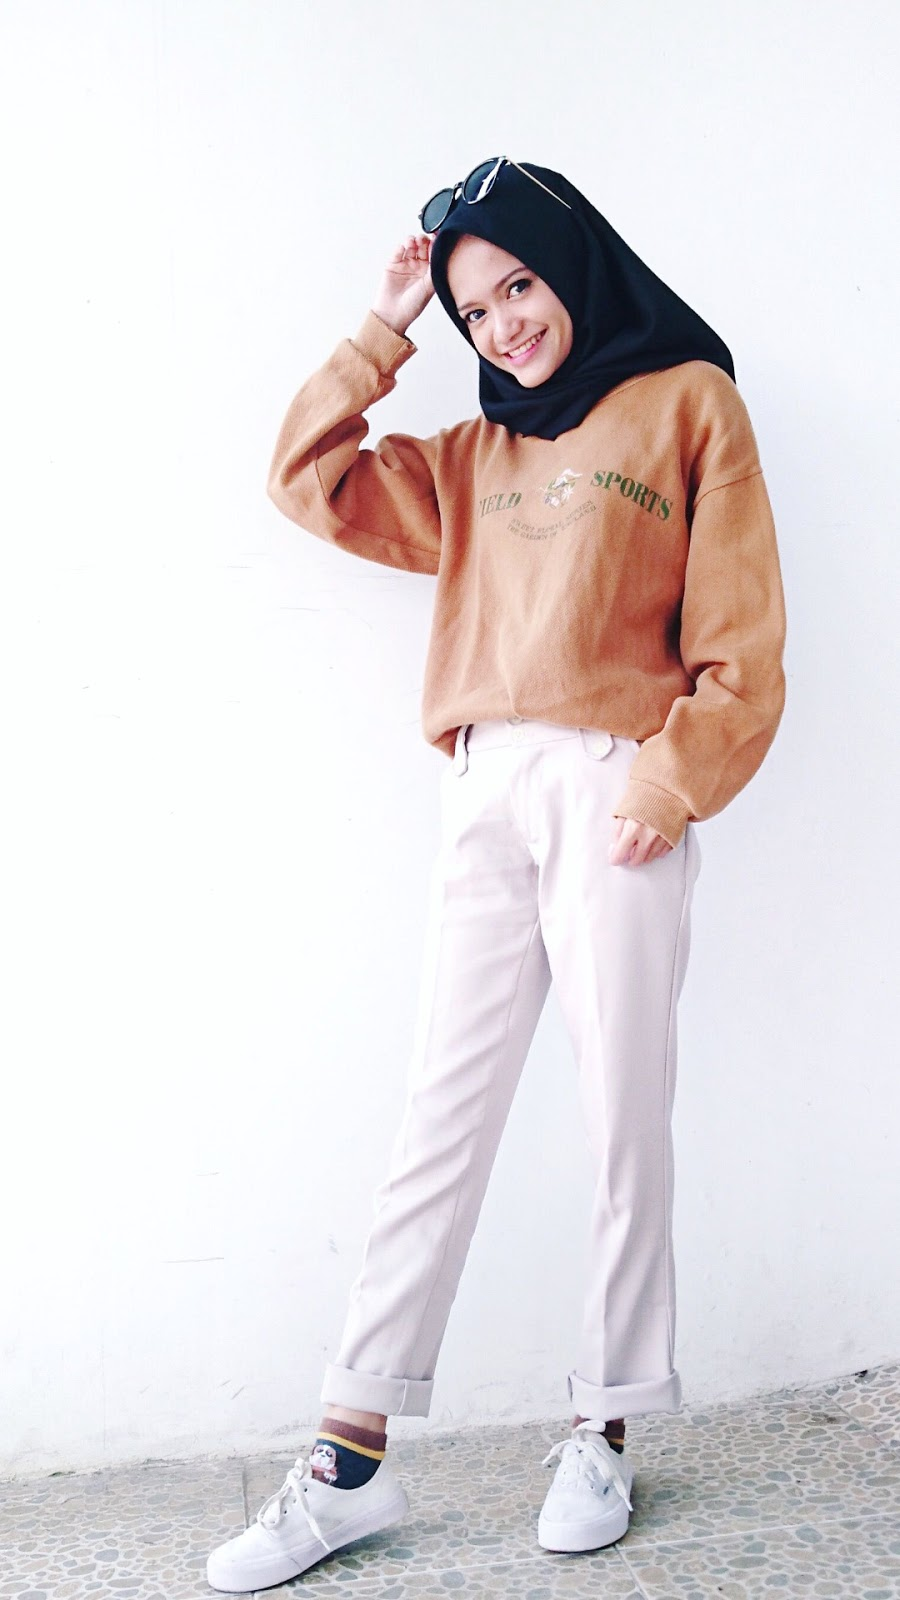 wallpaper hijab keren senym indah cewek tomboy dan imut